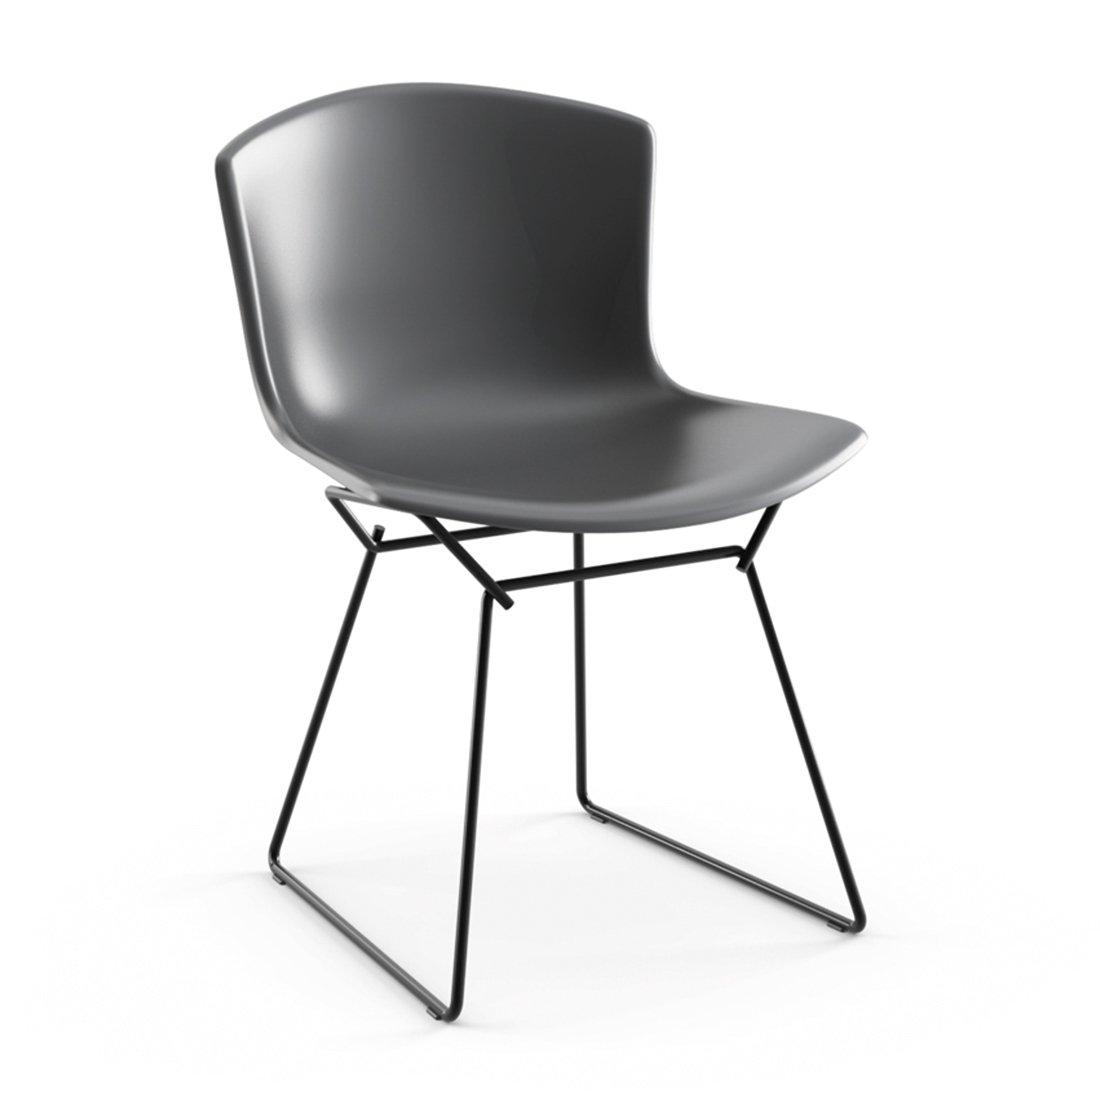 Knoll Bertoia Plastic Side Chair - Medium Grijs/Zwart